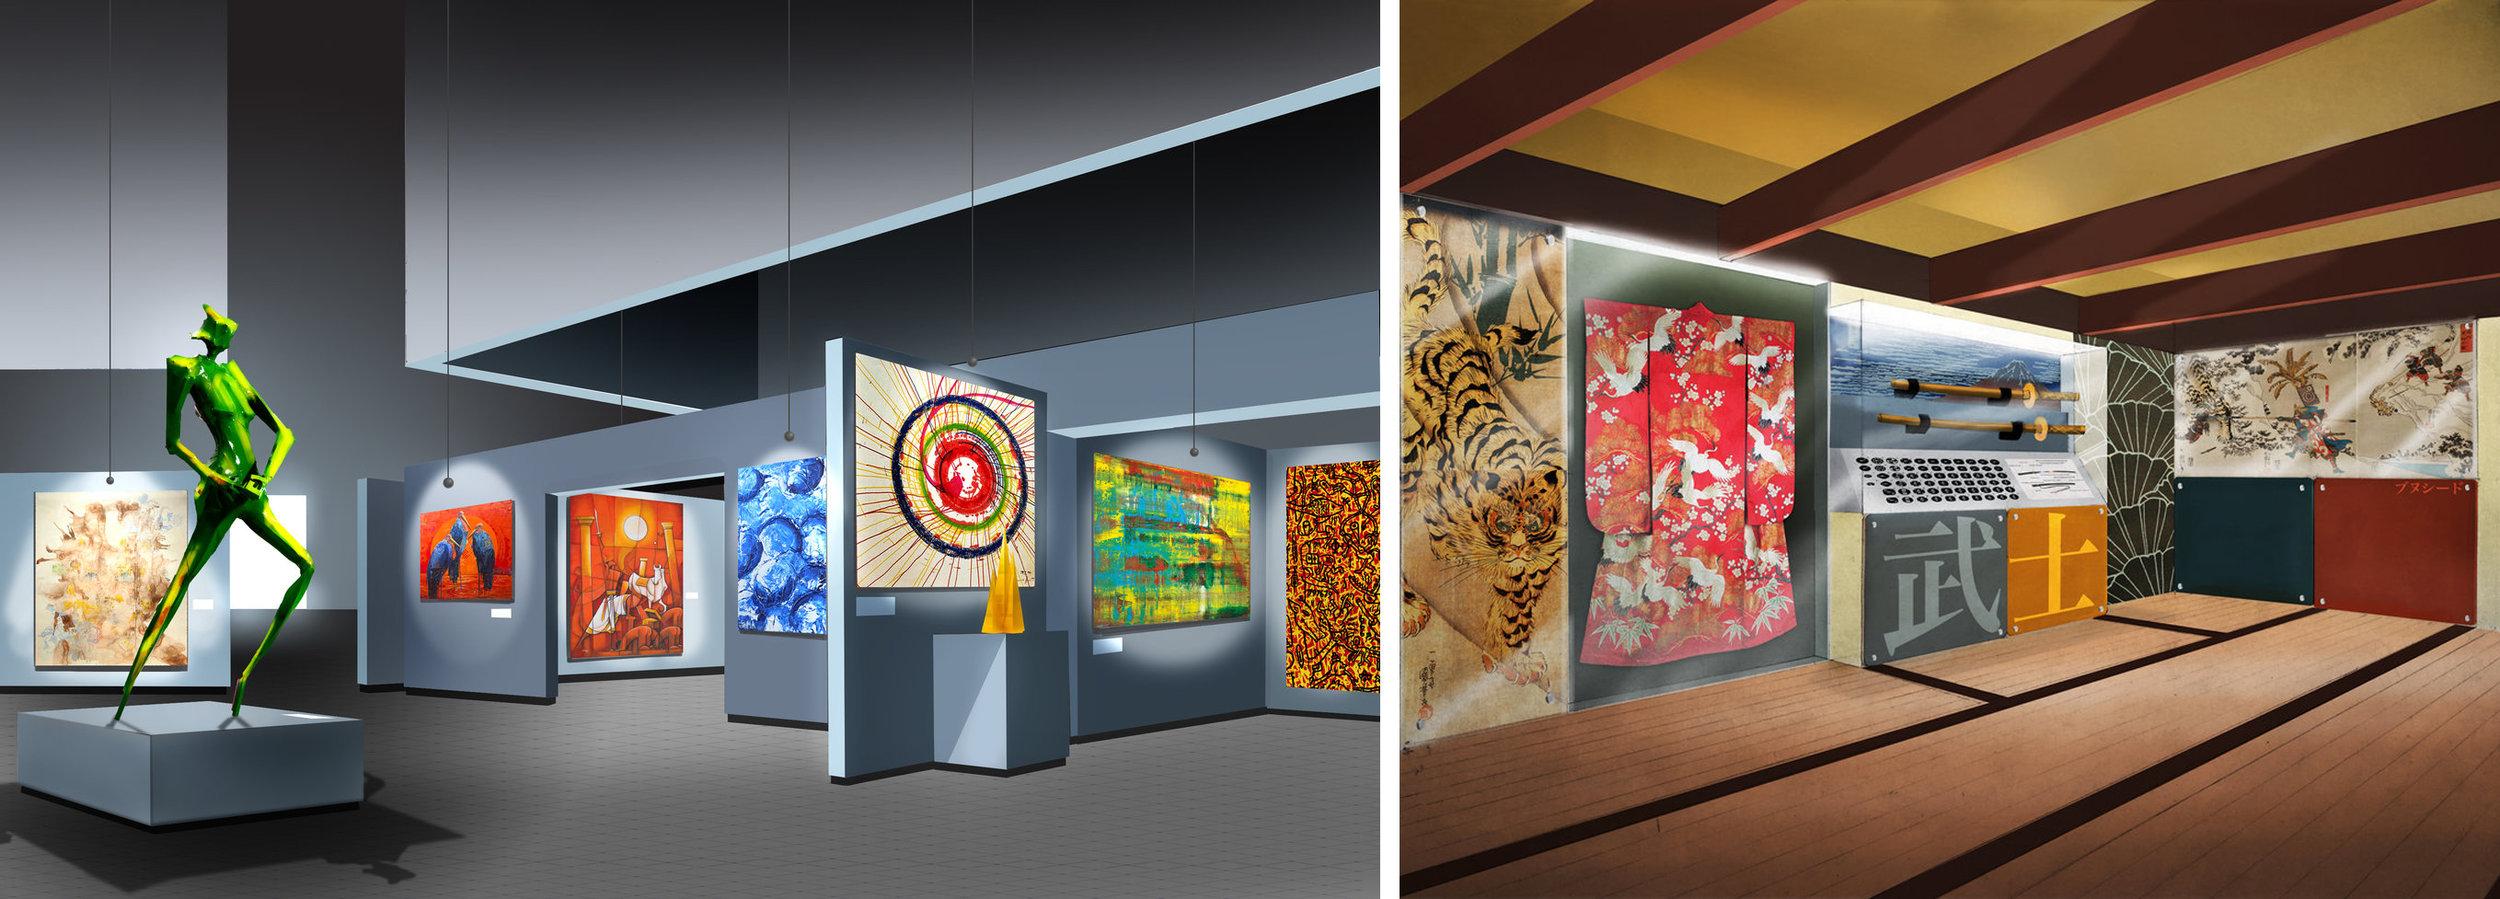 UX Design - Dayton Art Institute Gallery Shop and Japanese Exhibit Redesign Proposals